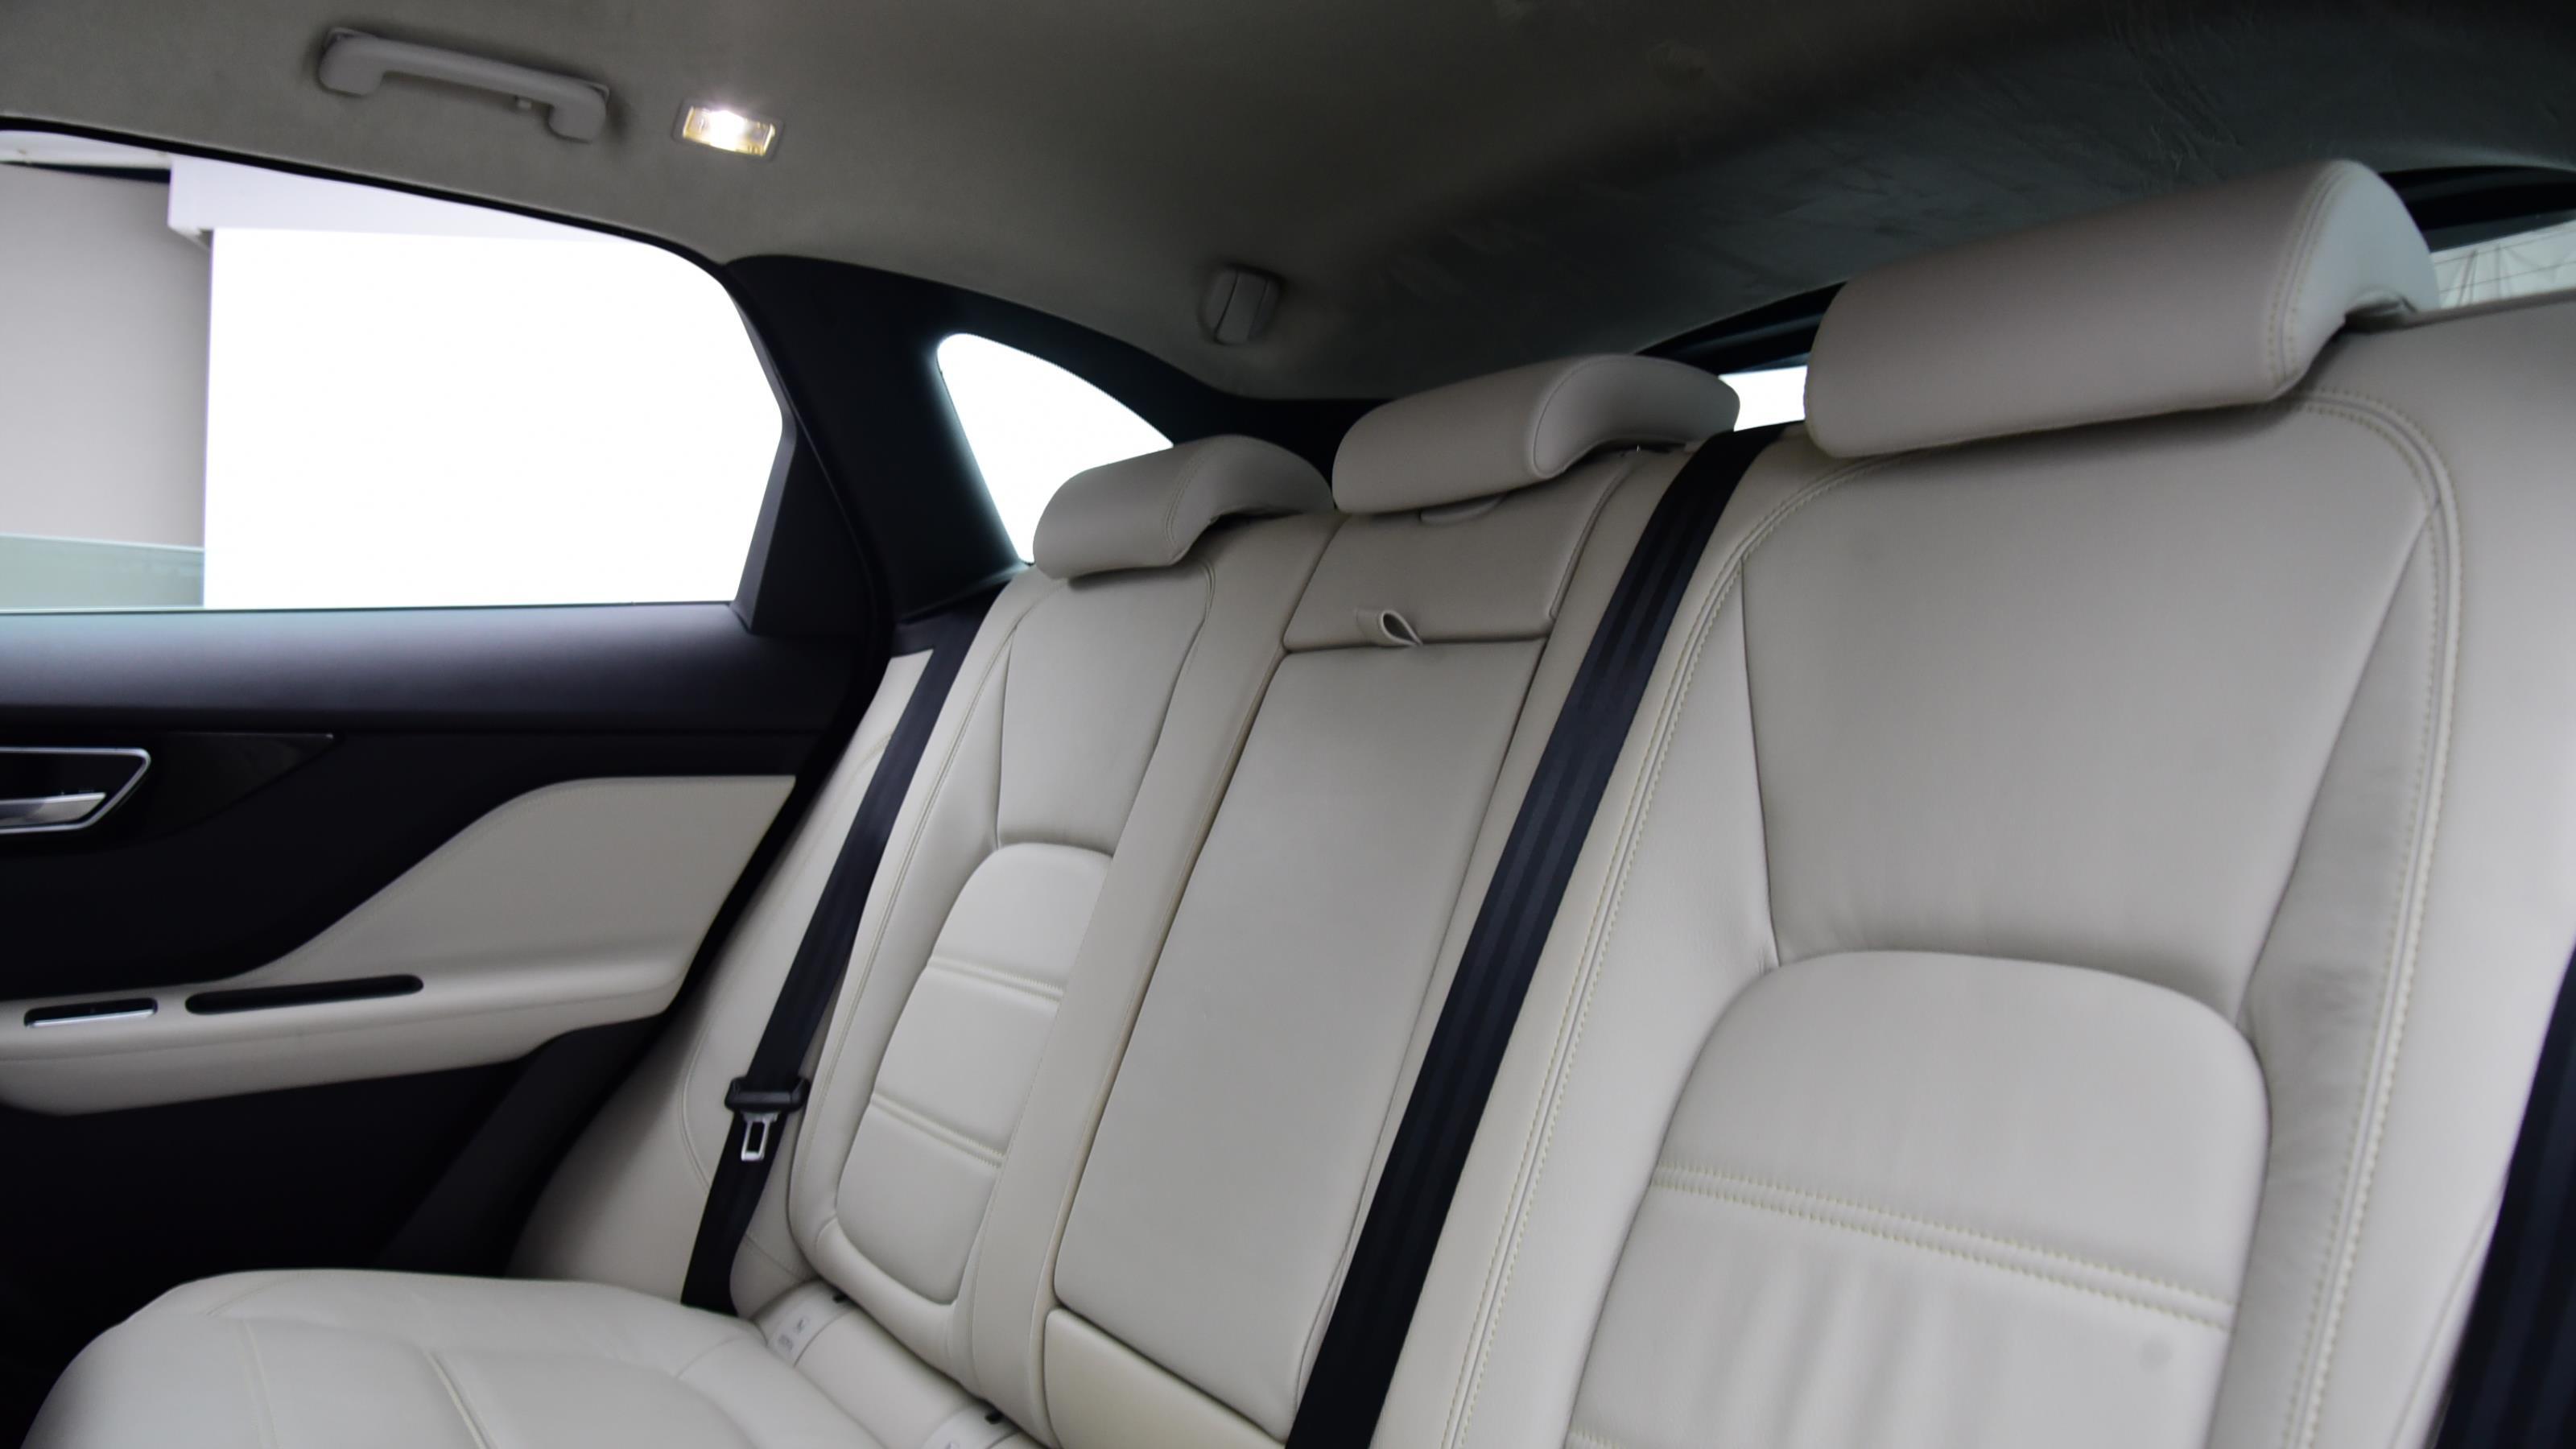 Used 2019 Jaguar F-PACE 2.0d Prestige 5dr Auto BLUE at Saxton4x4